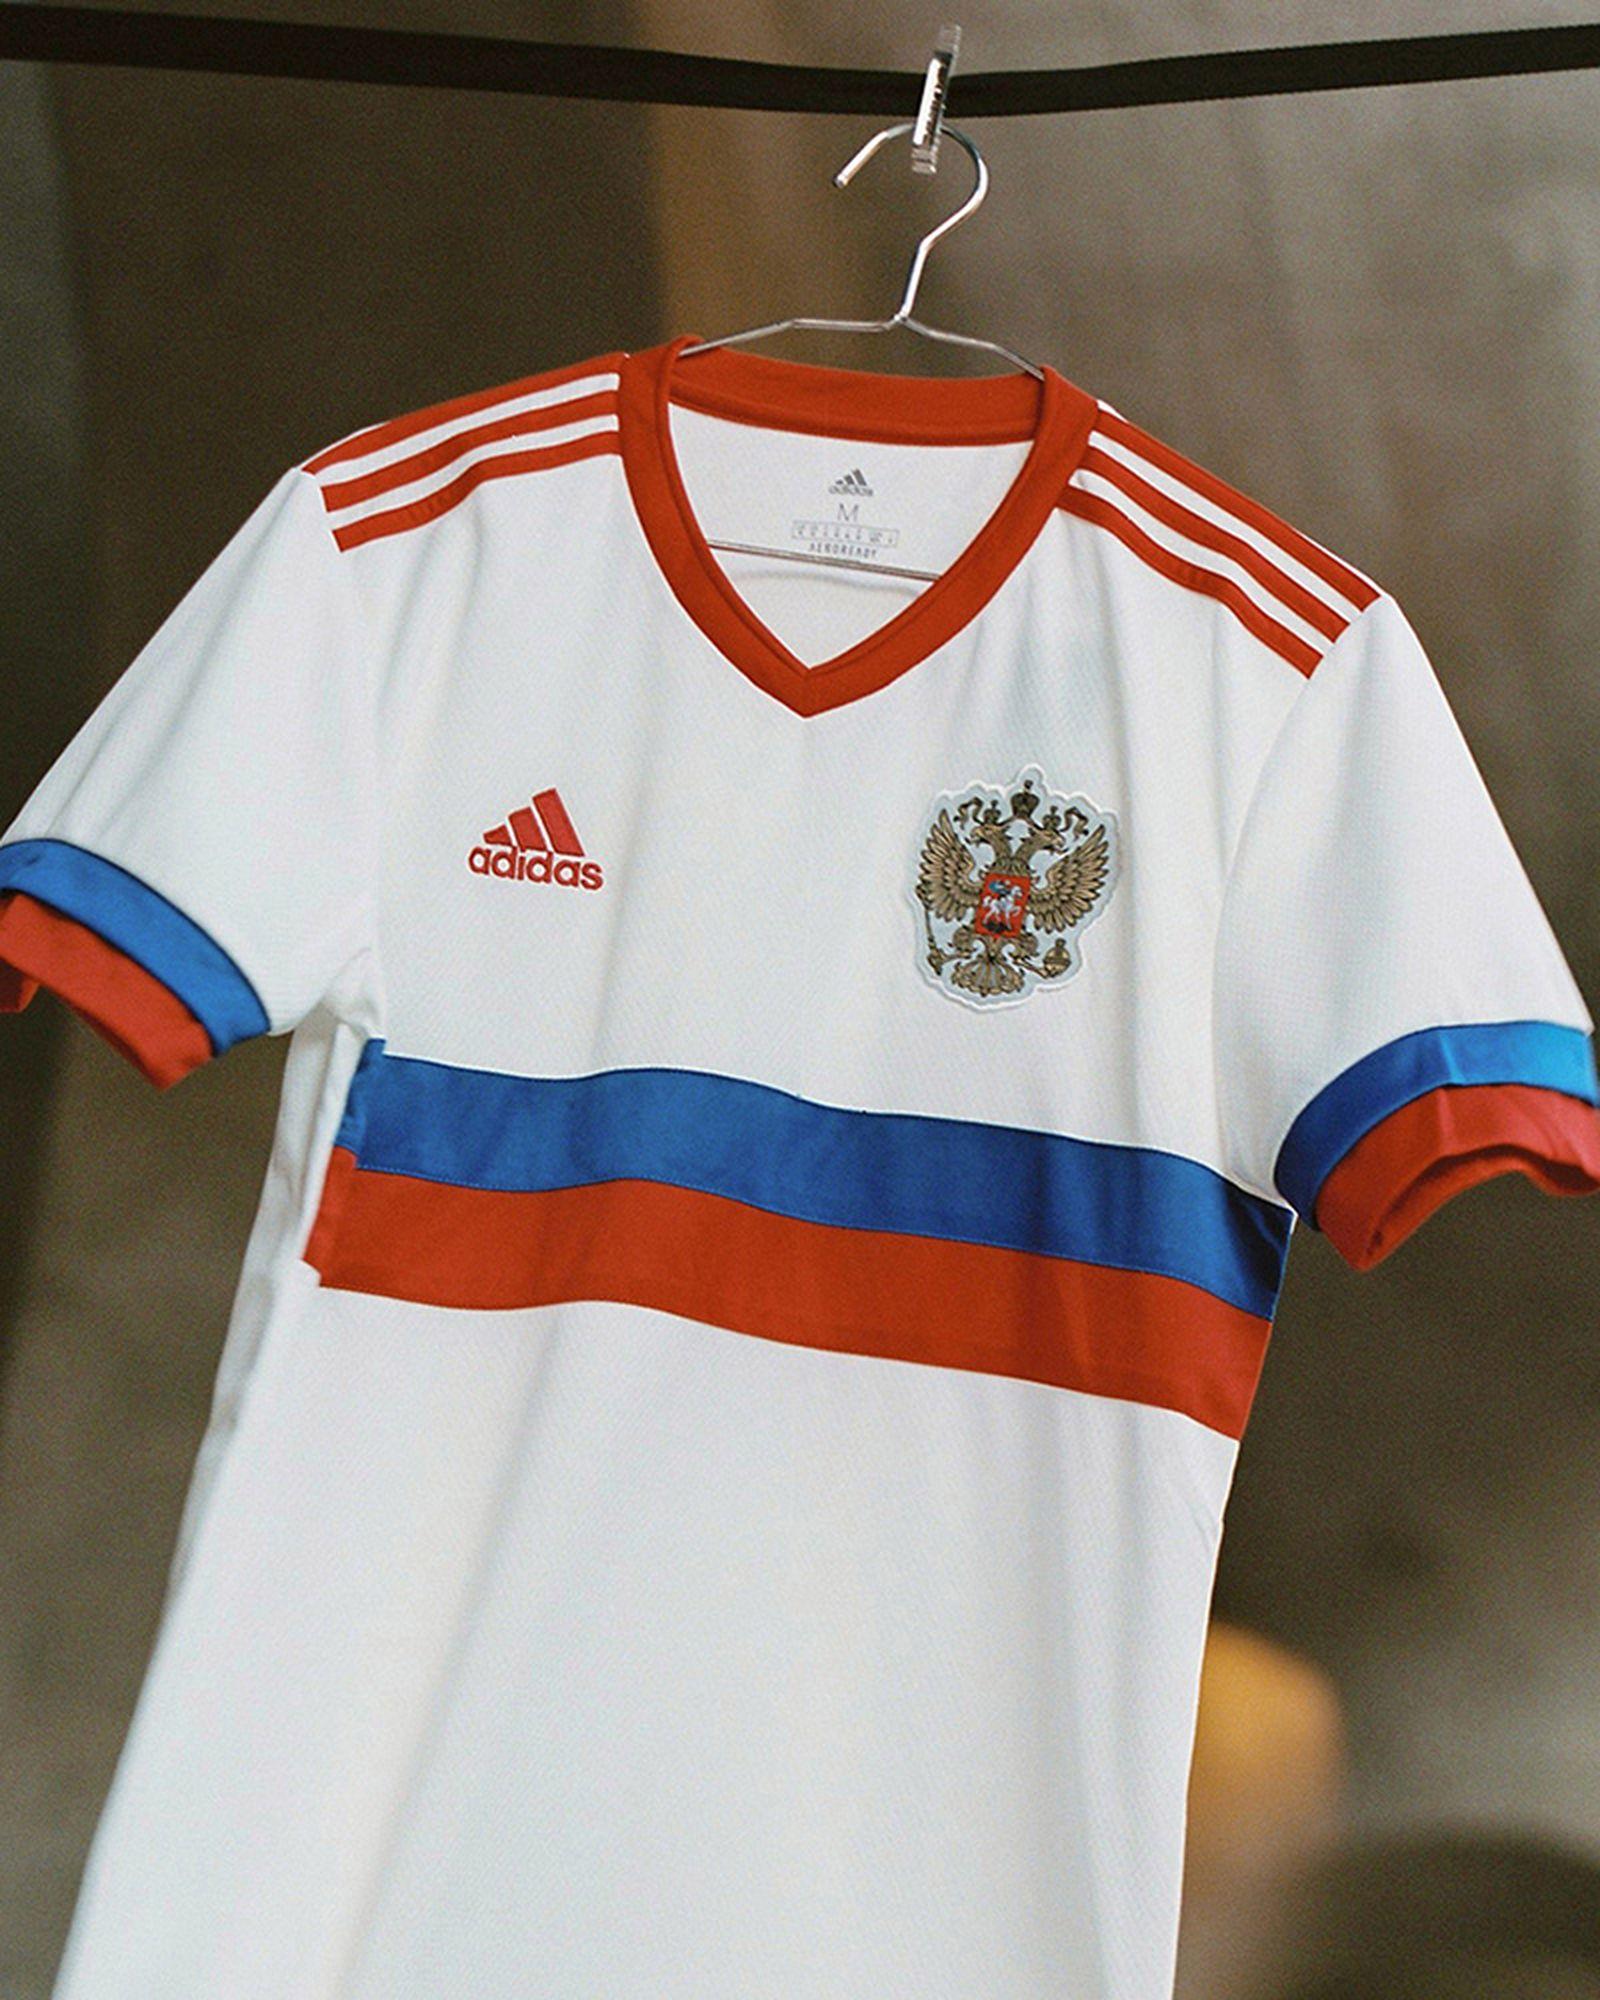 euro-2020-jersey-roundtable-ranking-adidas-01